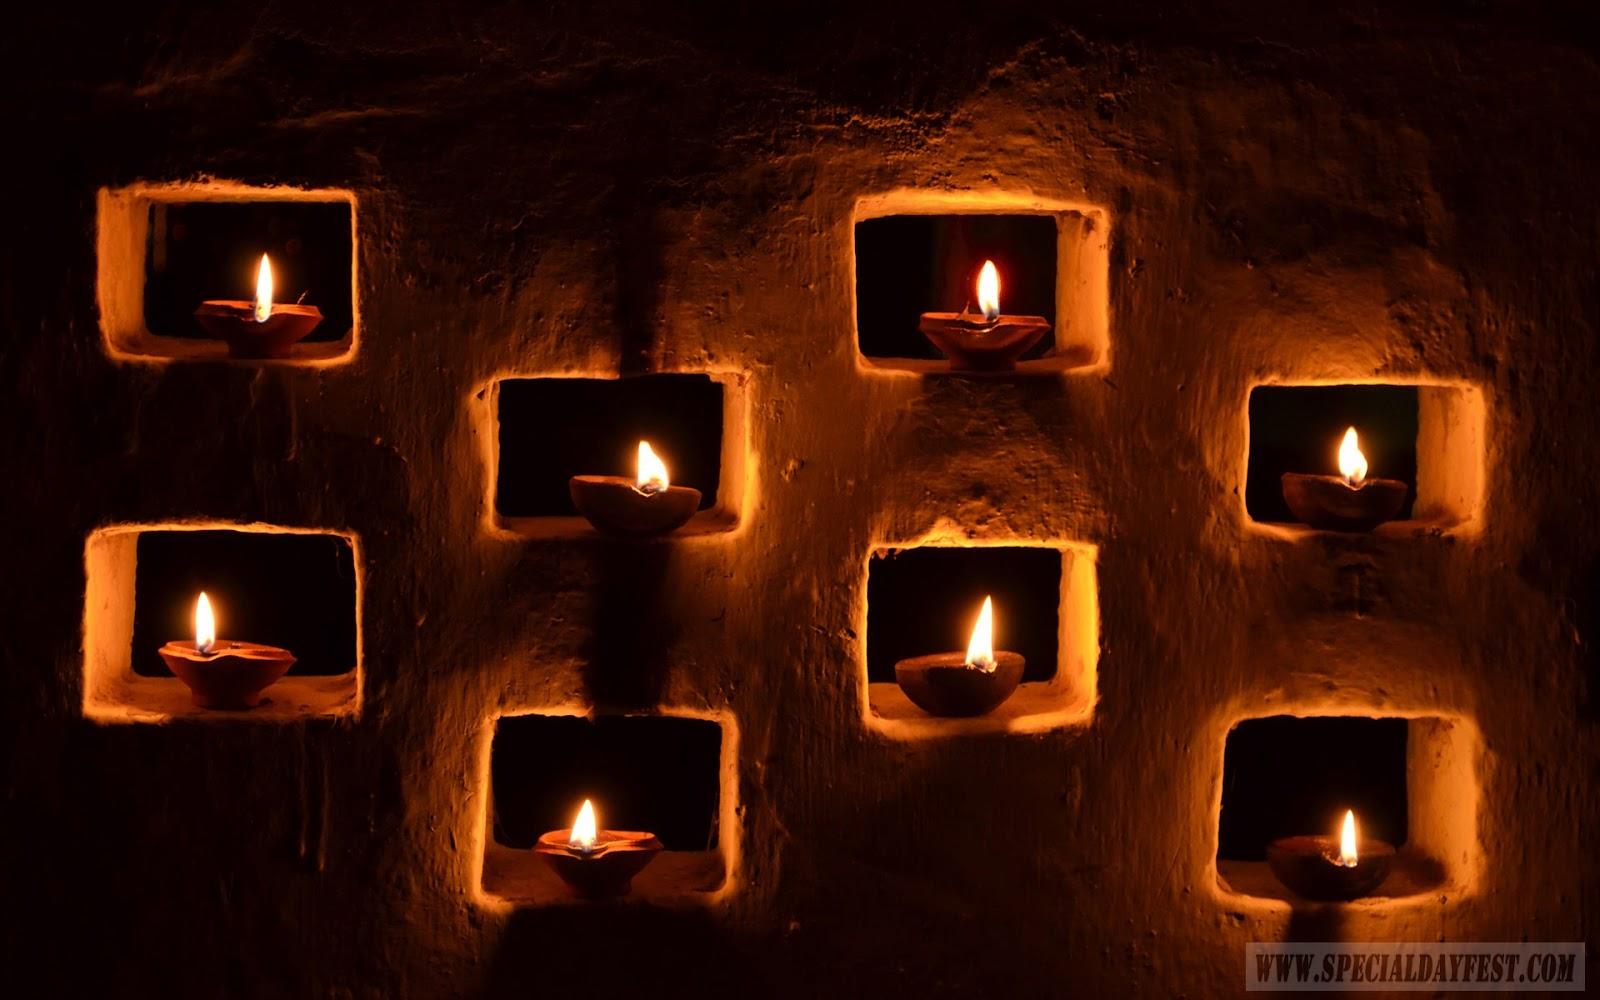 Foundation dezin decor diwali indian lighting ideas for Diwali decoration material